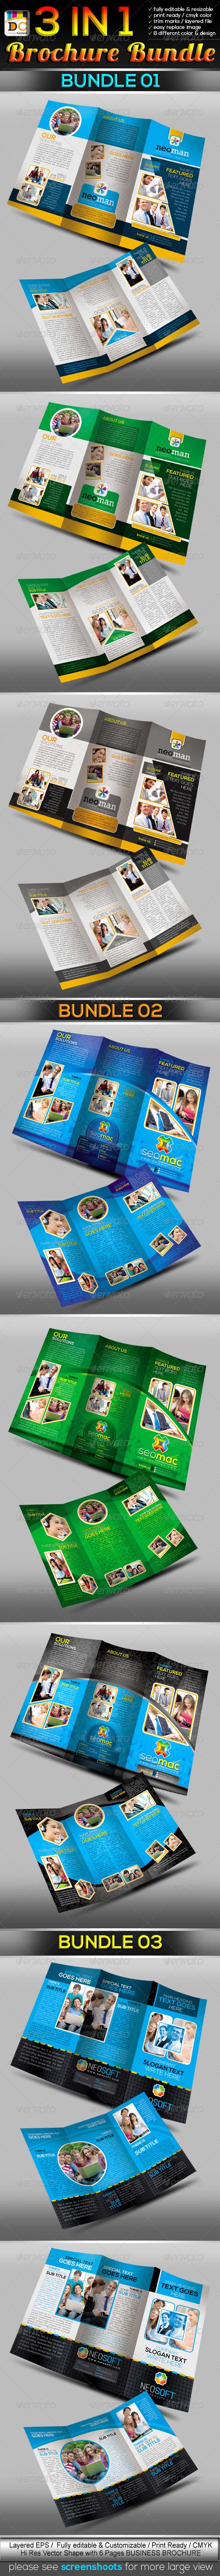 GraphicRiver 3 in 1 Corporate Tri-fold Business Brochure Bundl 3736772